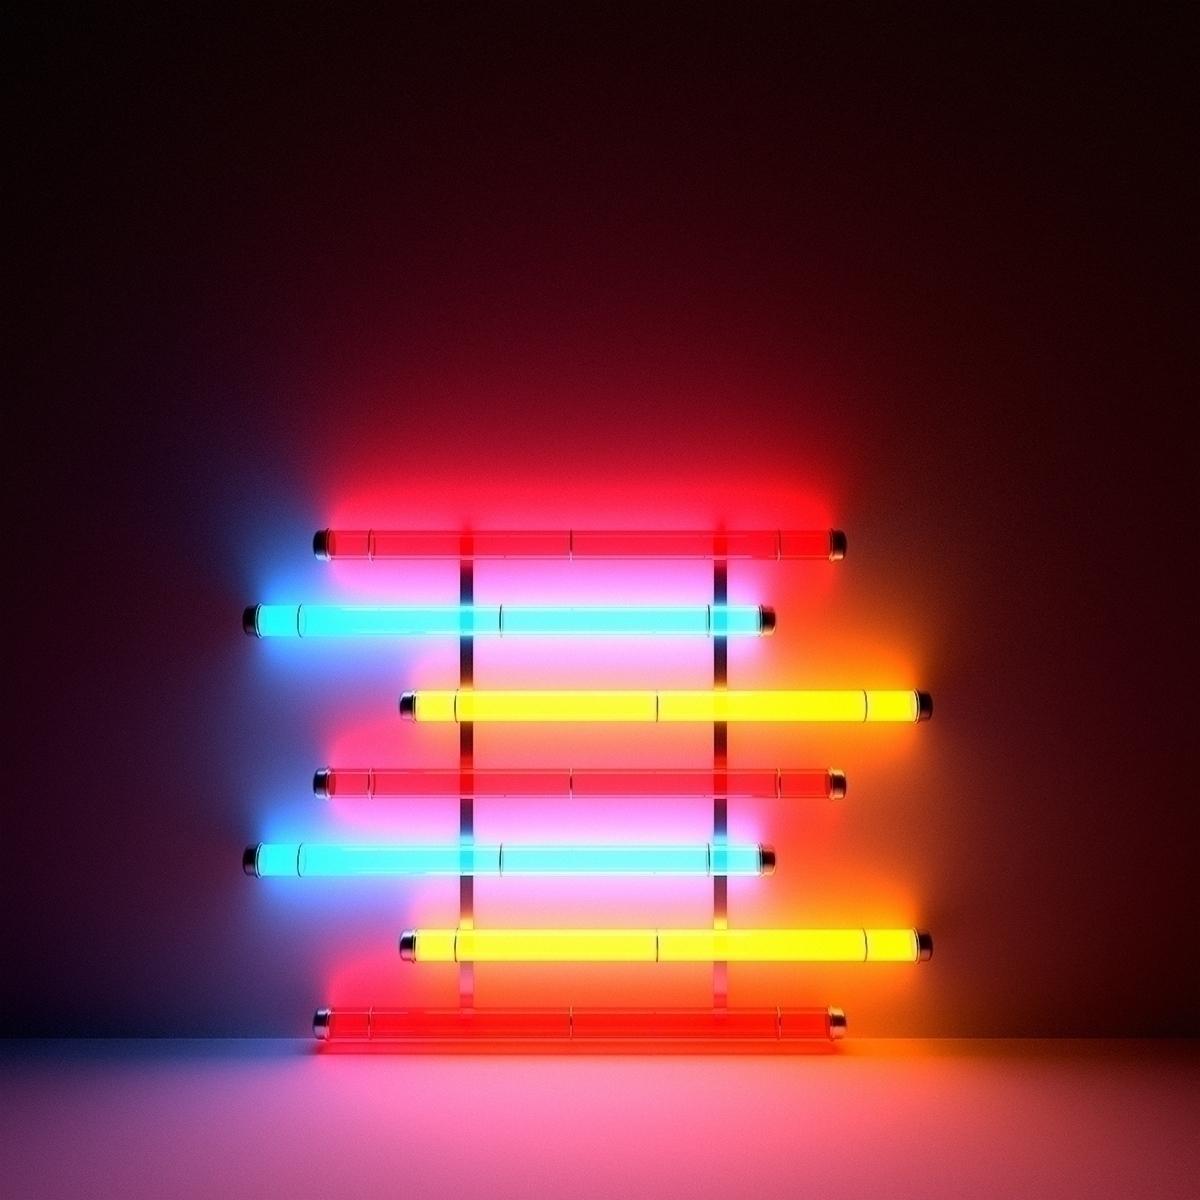 Architecture Light: Based Dan l - gerrytomkins | ello